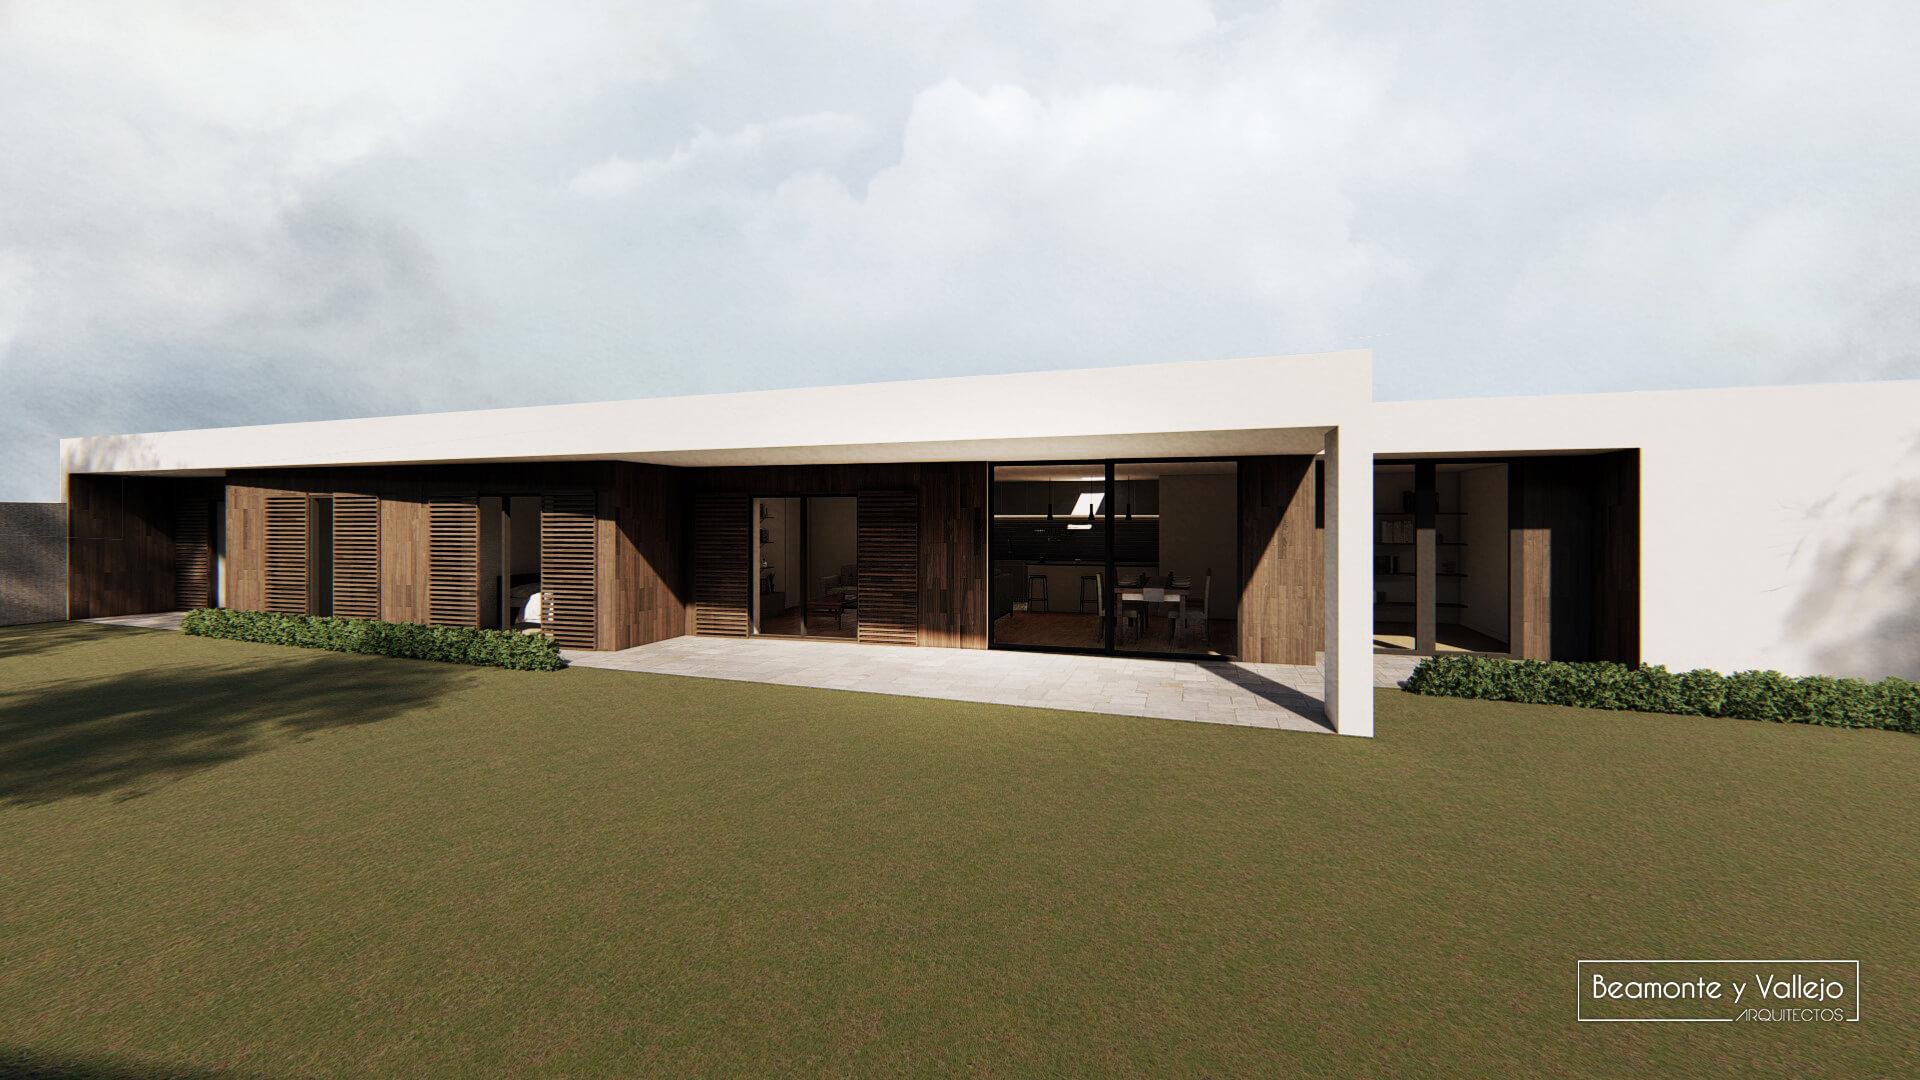 Beamonte y Vallejo Arquitectos - Passivhaus Pradejón 1